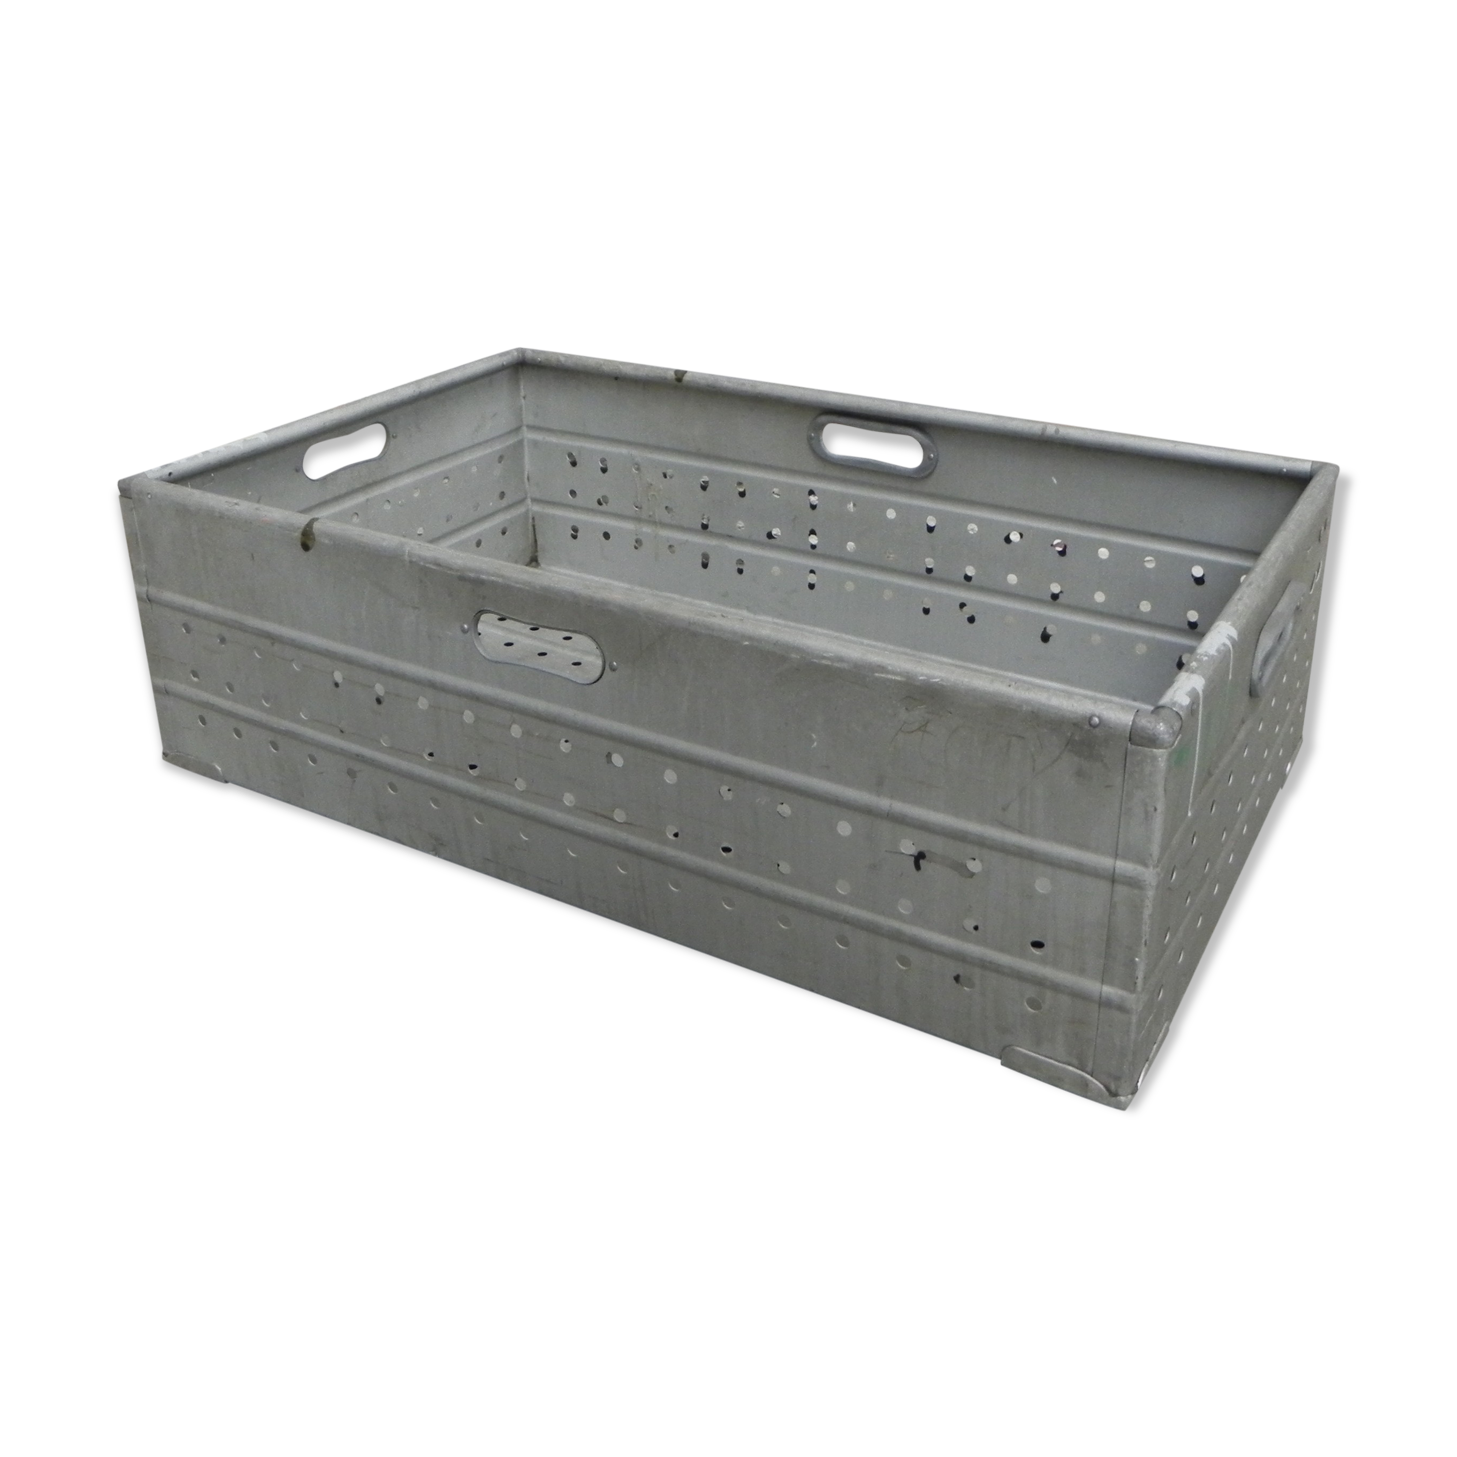 Caisse industrielle en aluminium